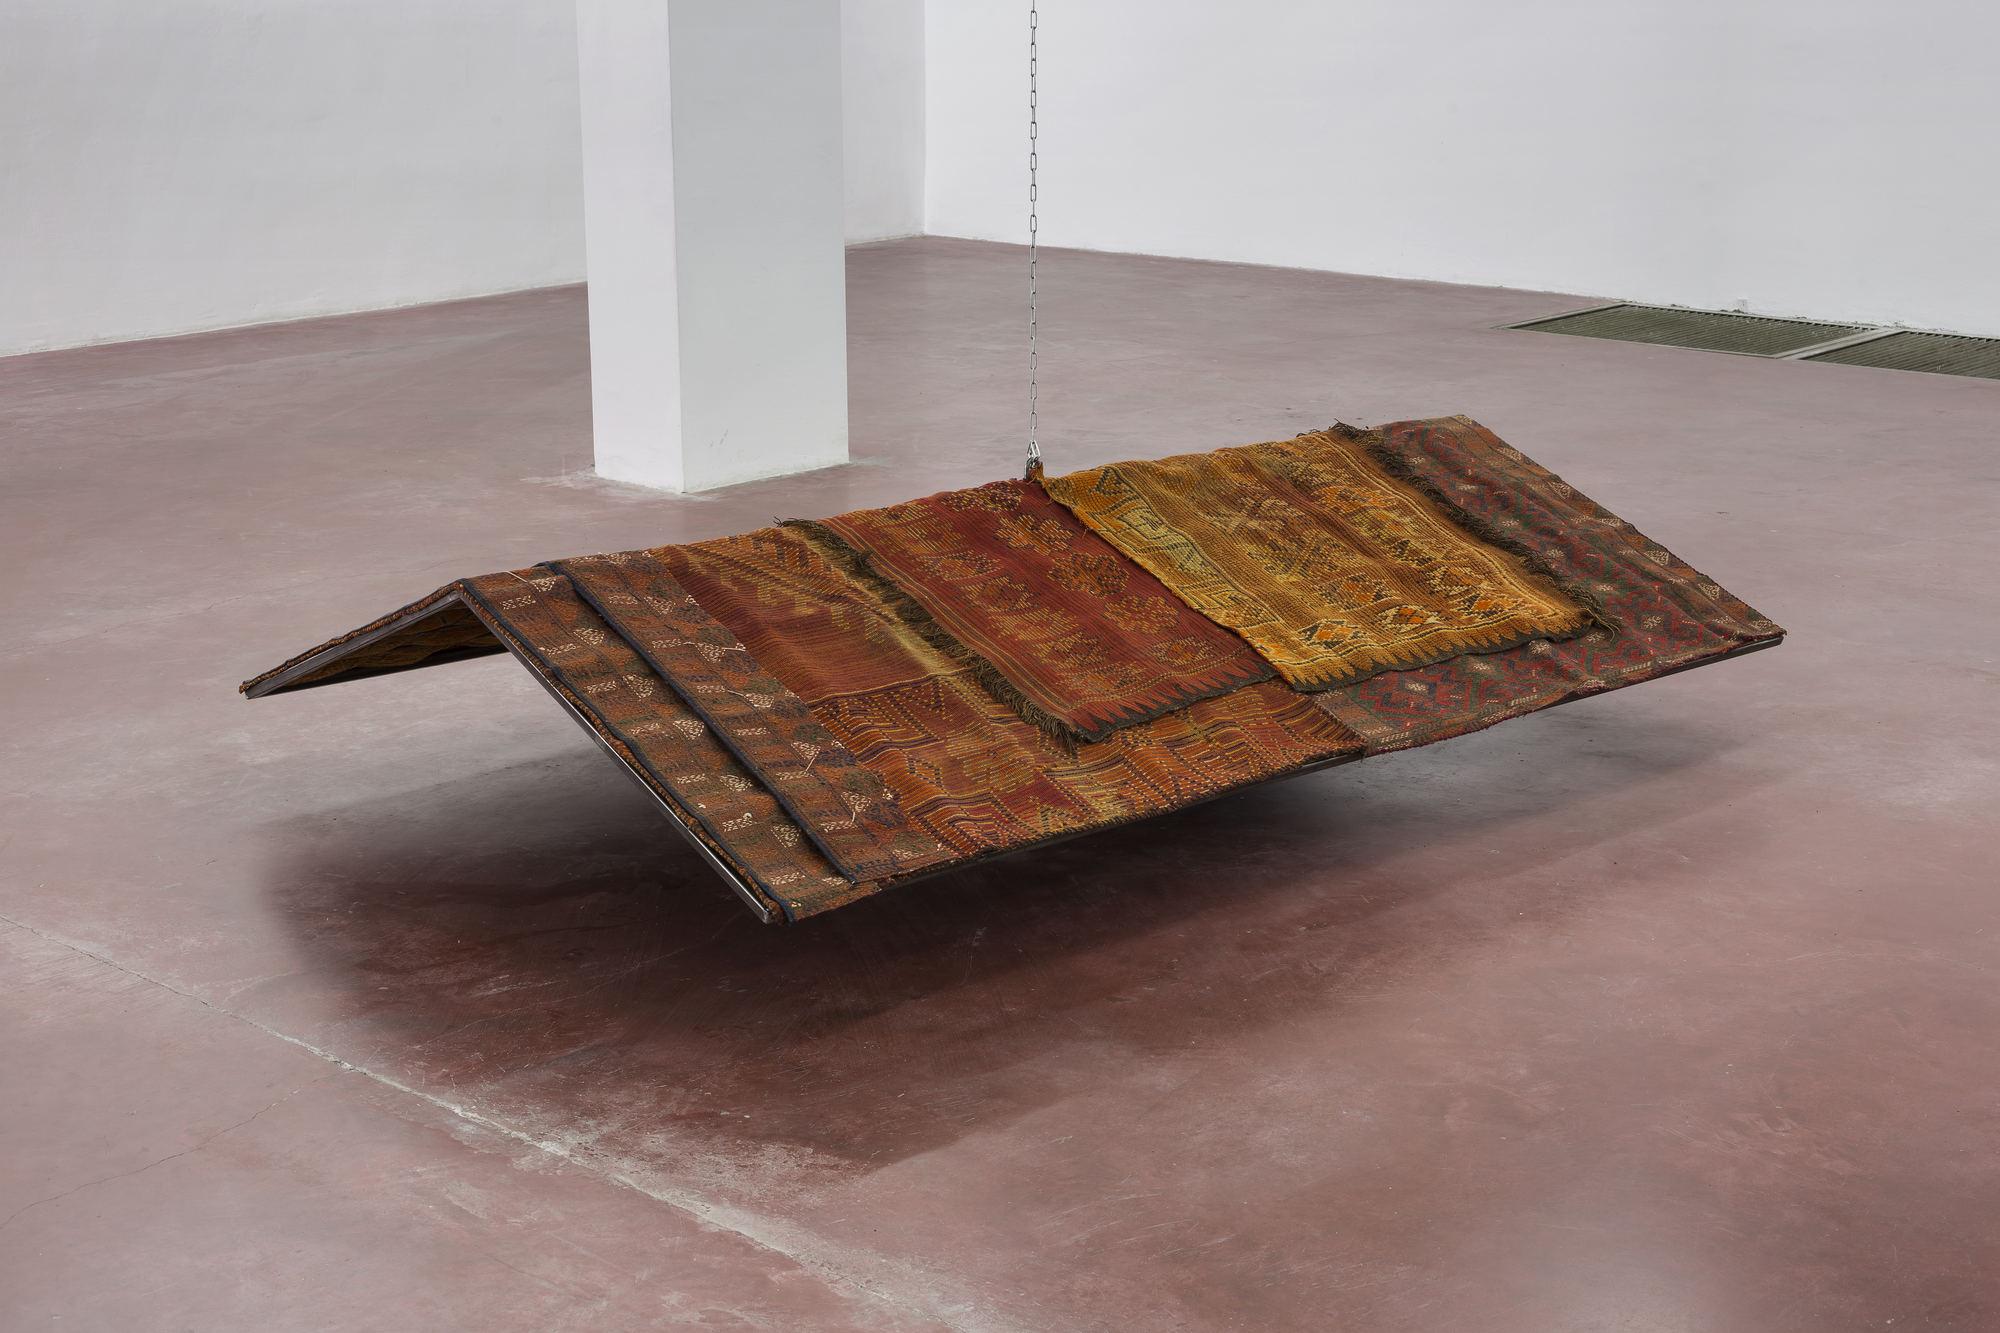 Miroslaw Balka, 180 x180 x 53 domestic shelter, 2015, steel, carpet, 53 x180 x 120 cm, unique